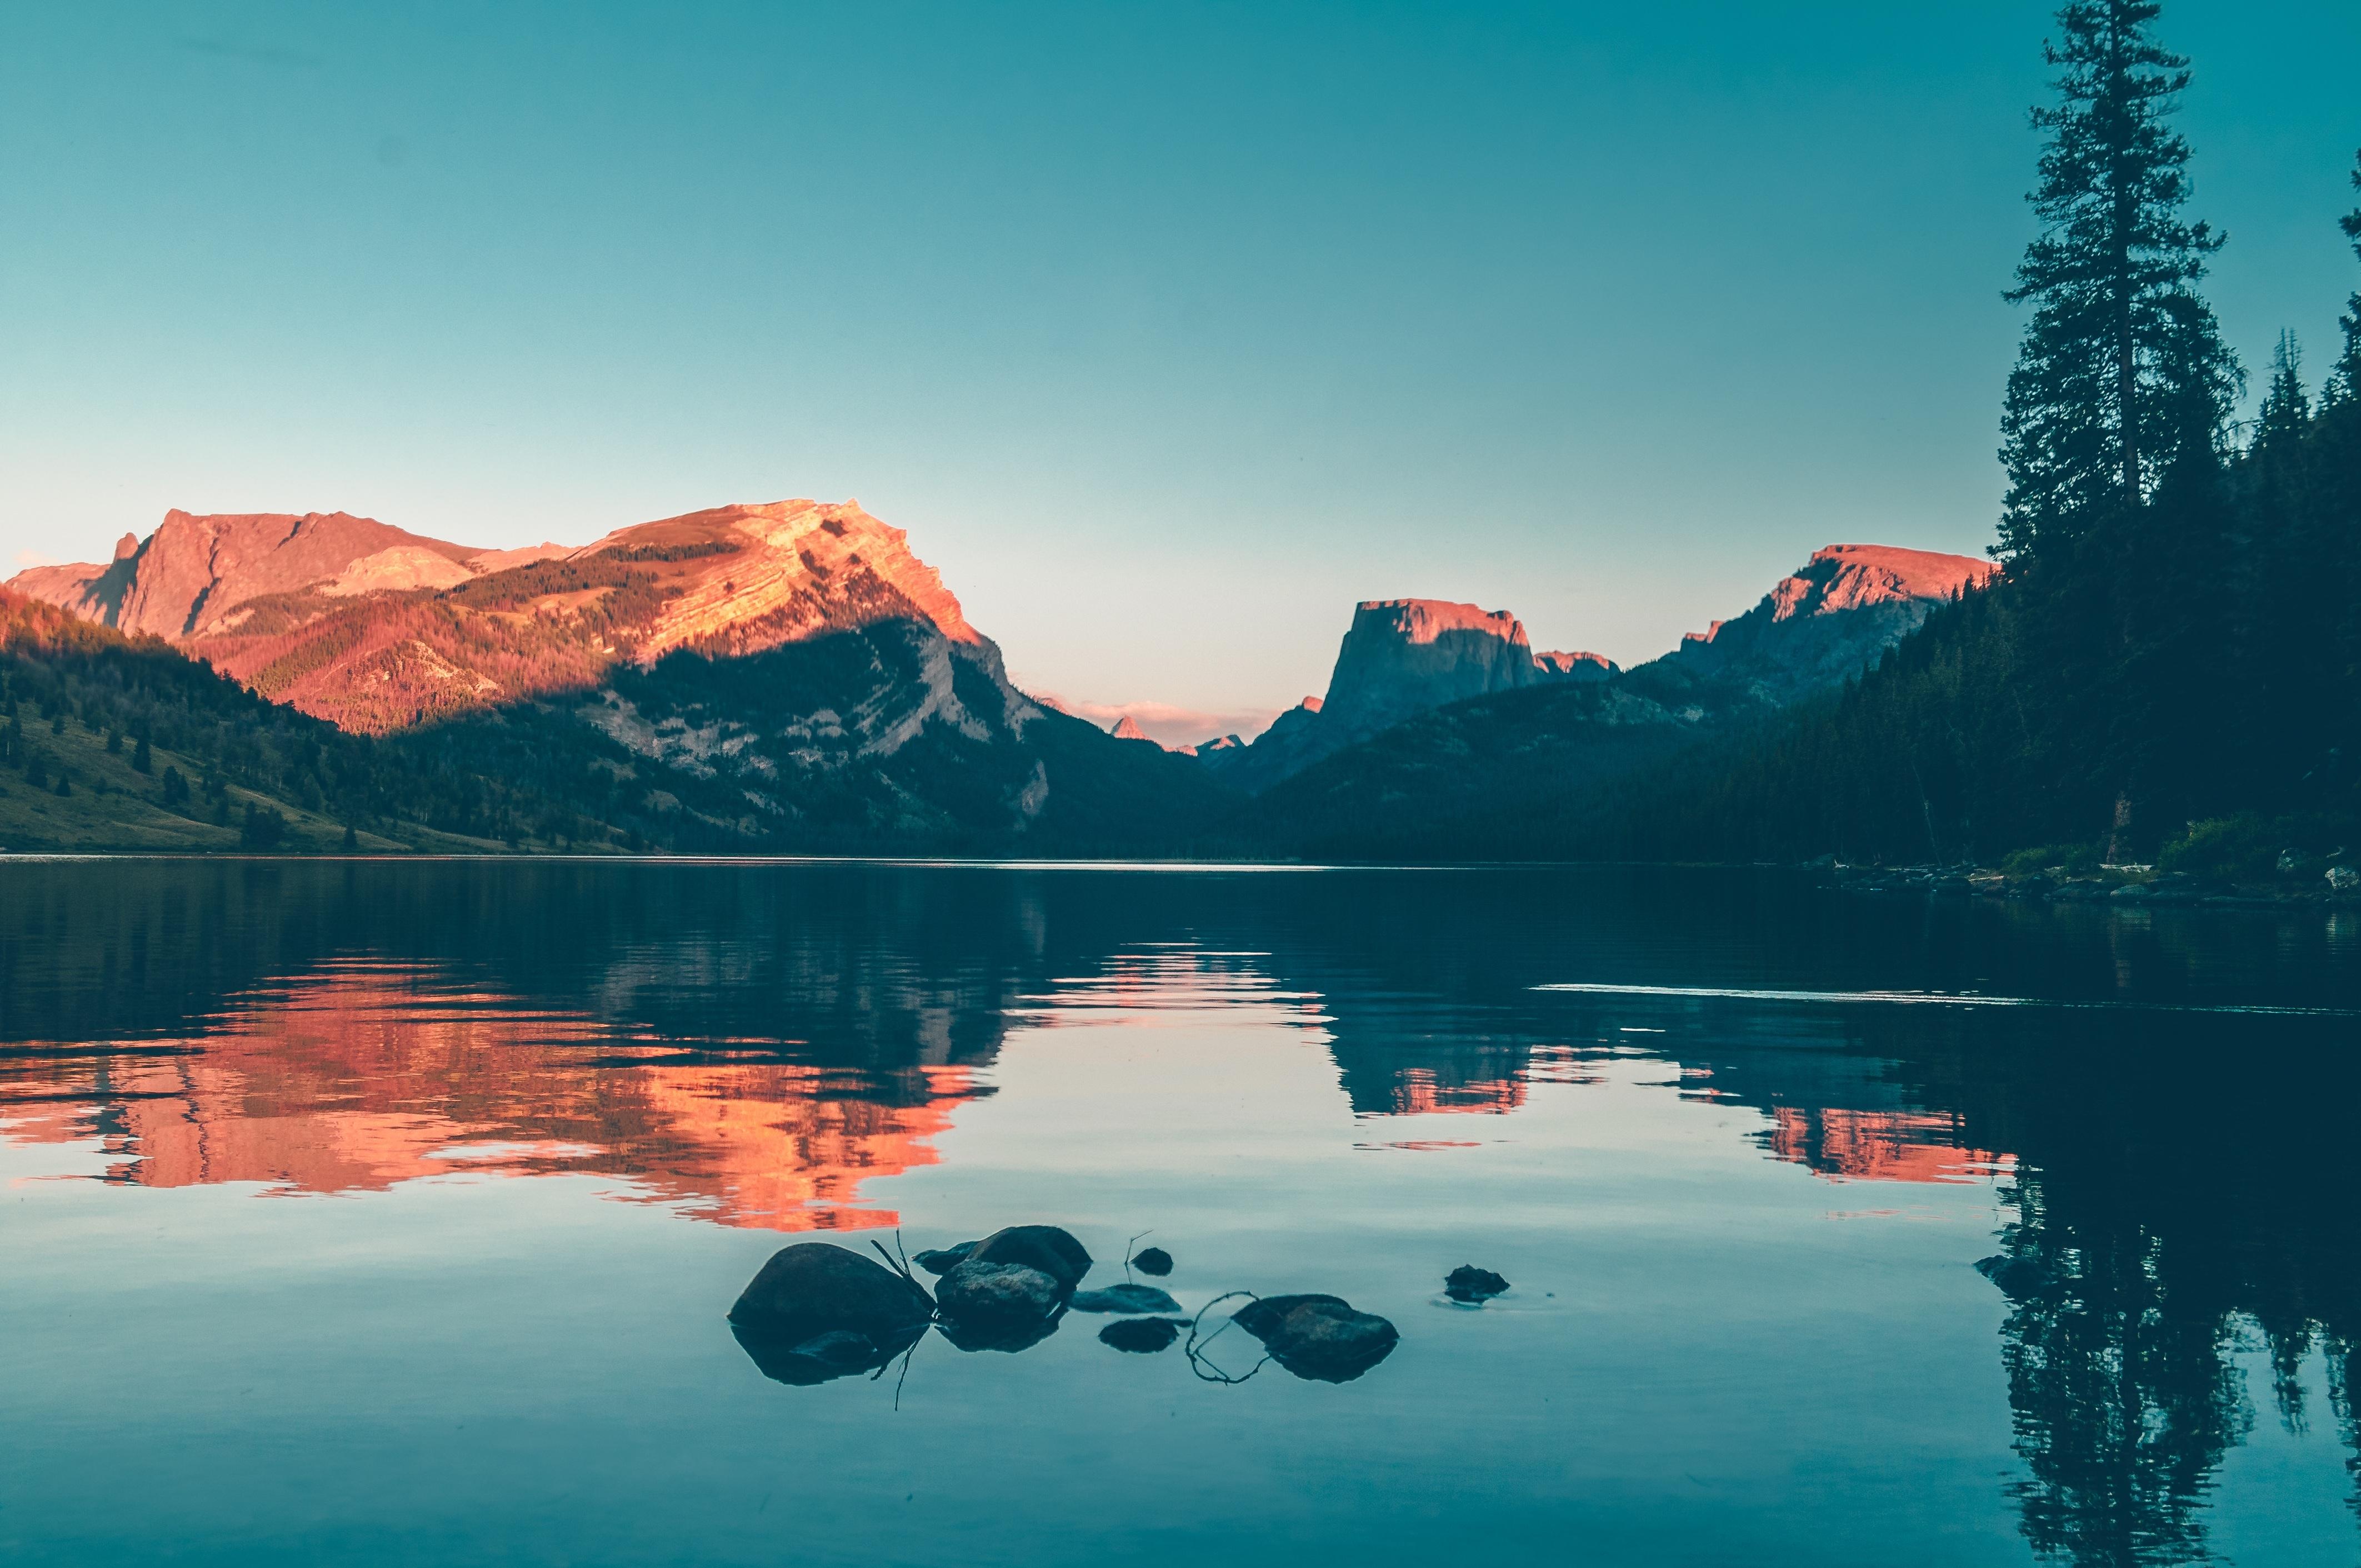 55+ Gambar Pemandangan Gunung Dan Lautan Terbaik